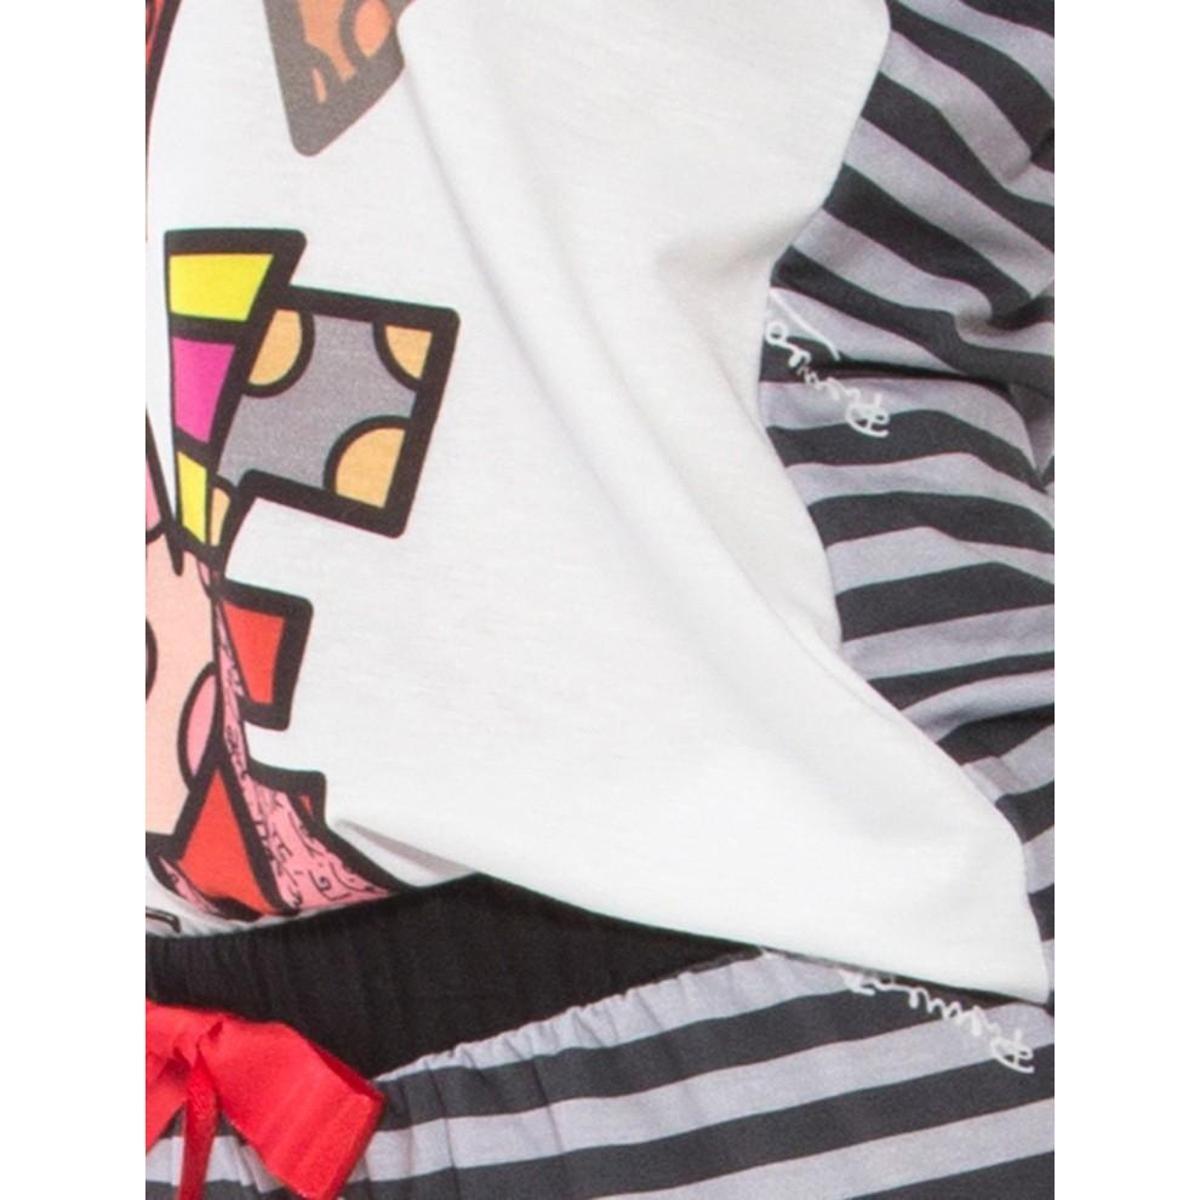 09175 Femino Recco Pijama Verão Curto Curto Recco Femino Pijama Branco Verão XTAzqwSnx